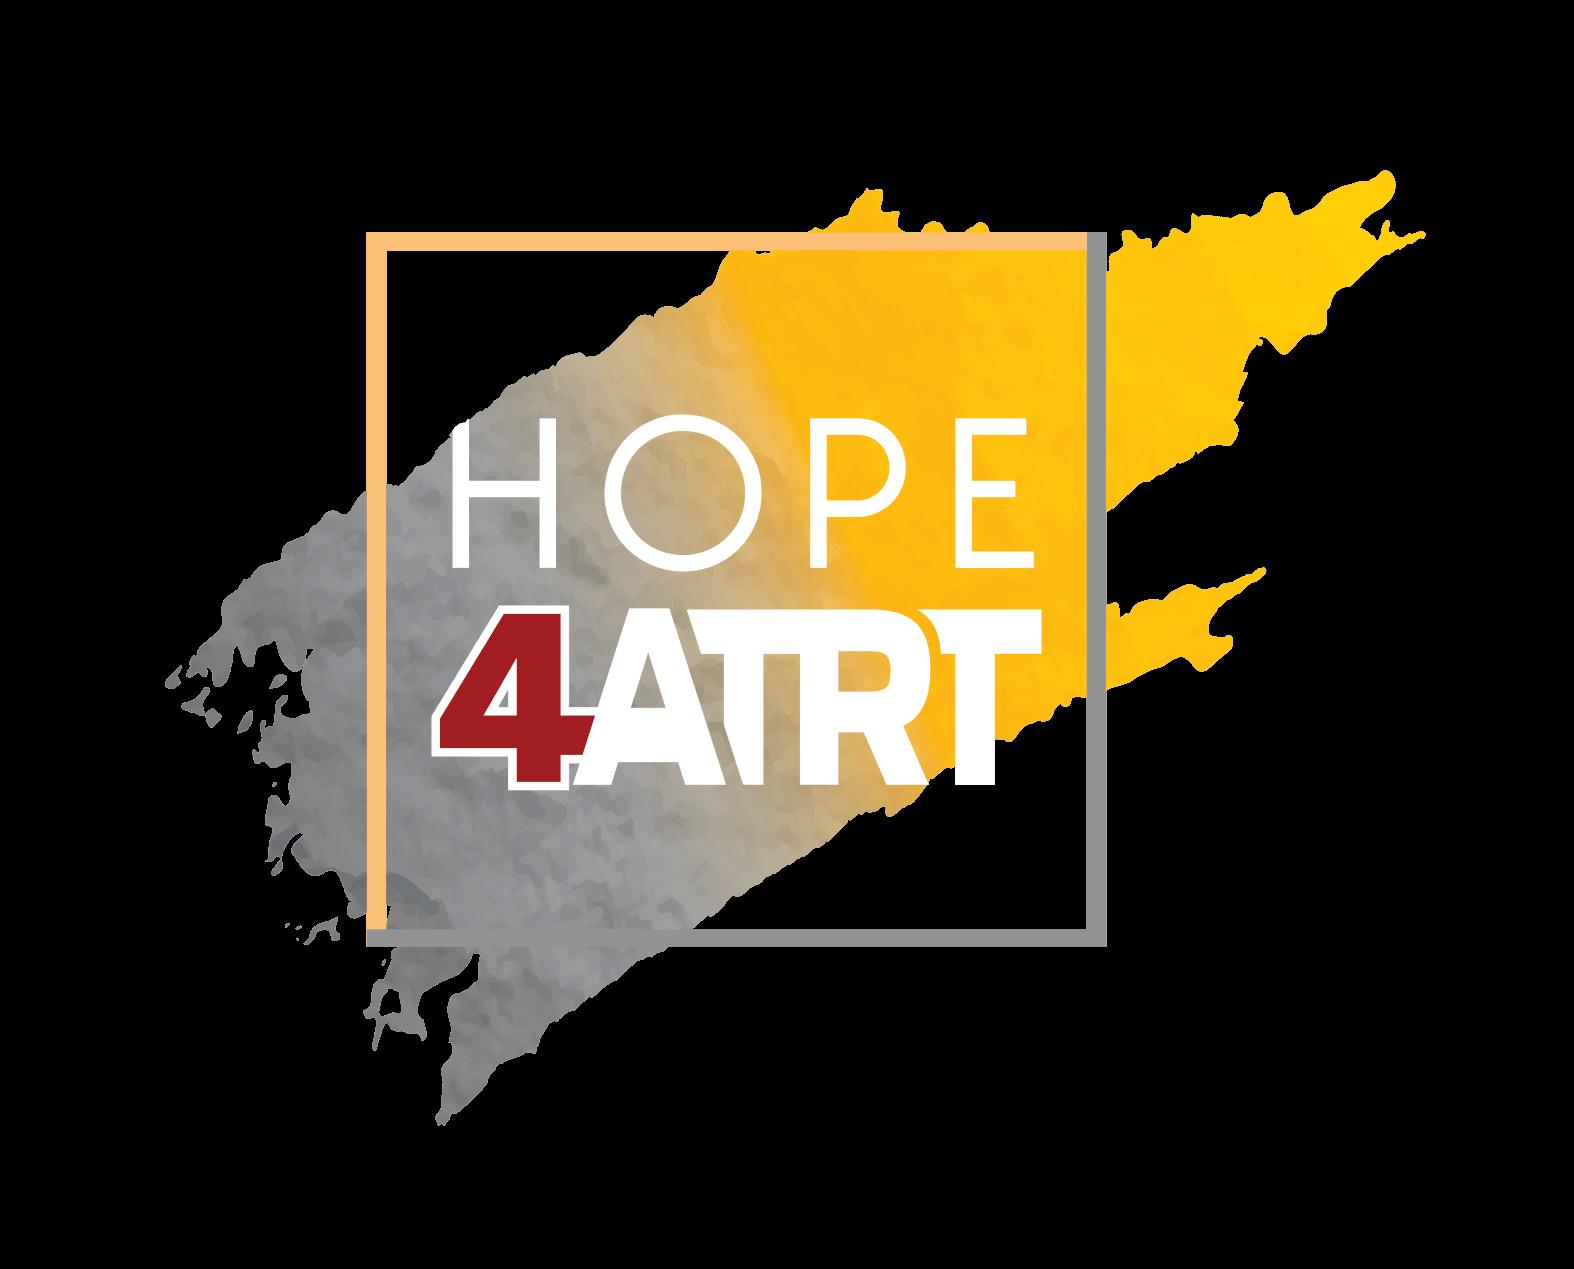 Hope4Art